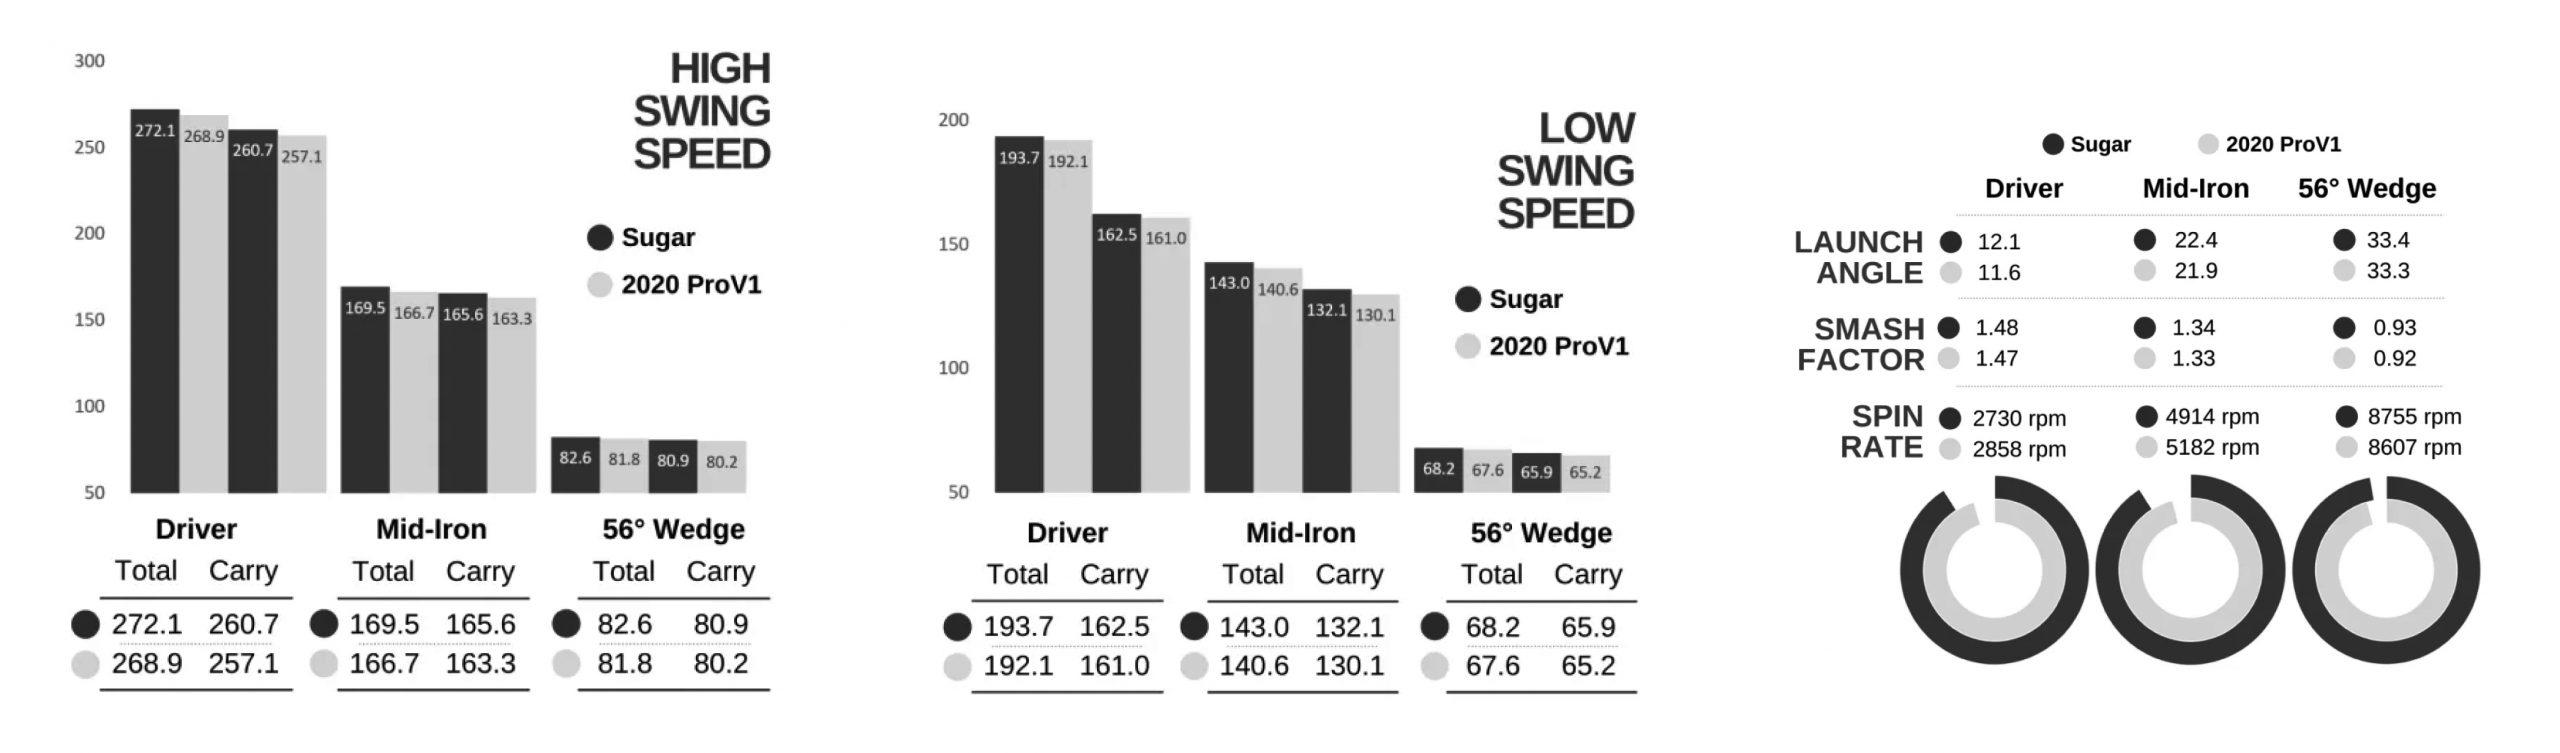 Sugar Golf Infographic